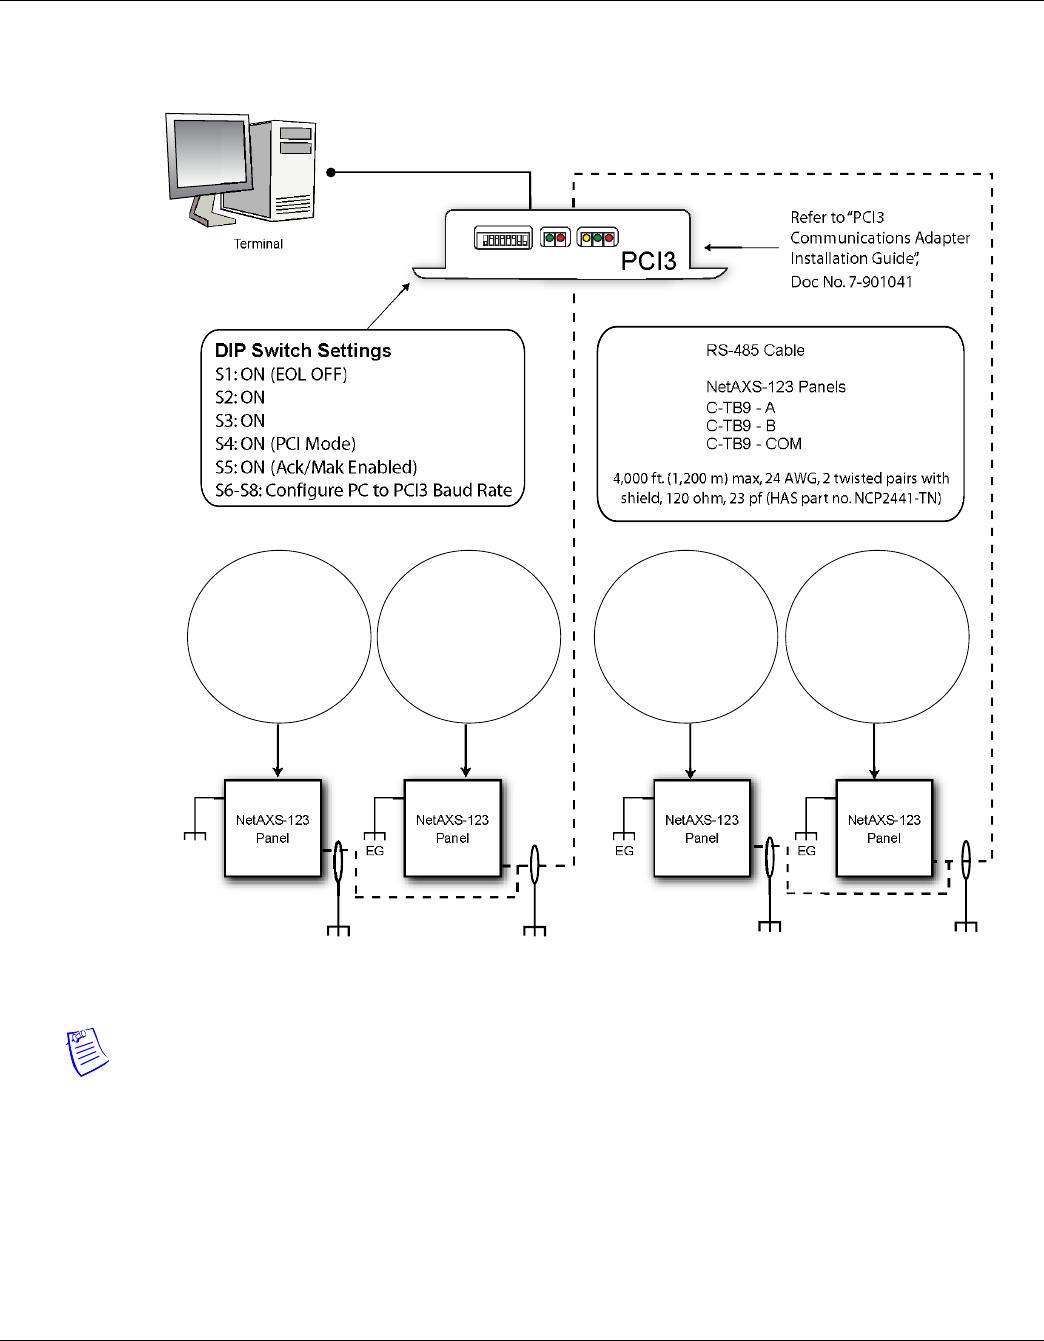 Honeywell Network Hardware Netaxs 123 Users Manual Netaxs 123 Standard Compact Install